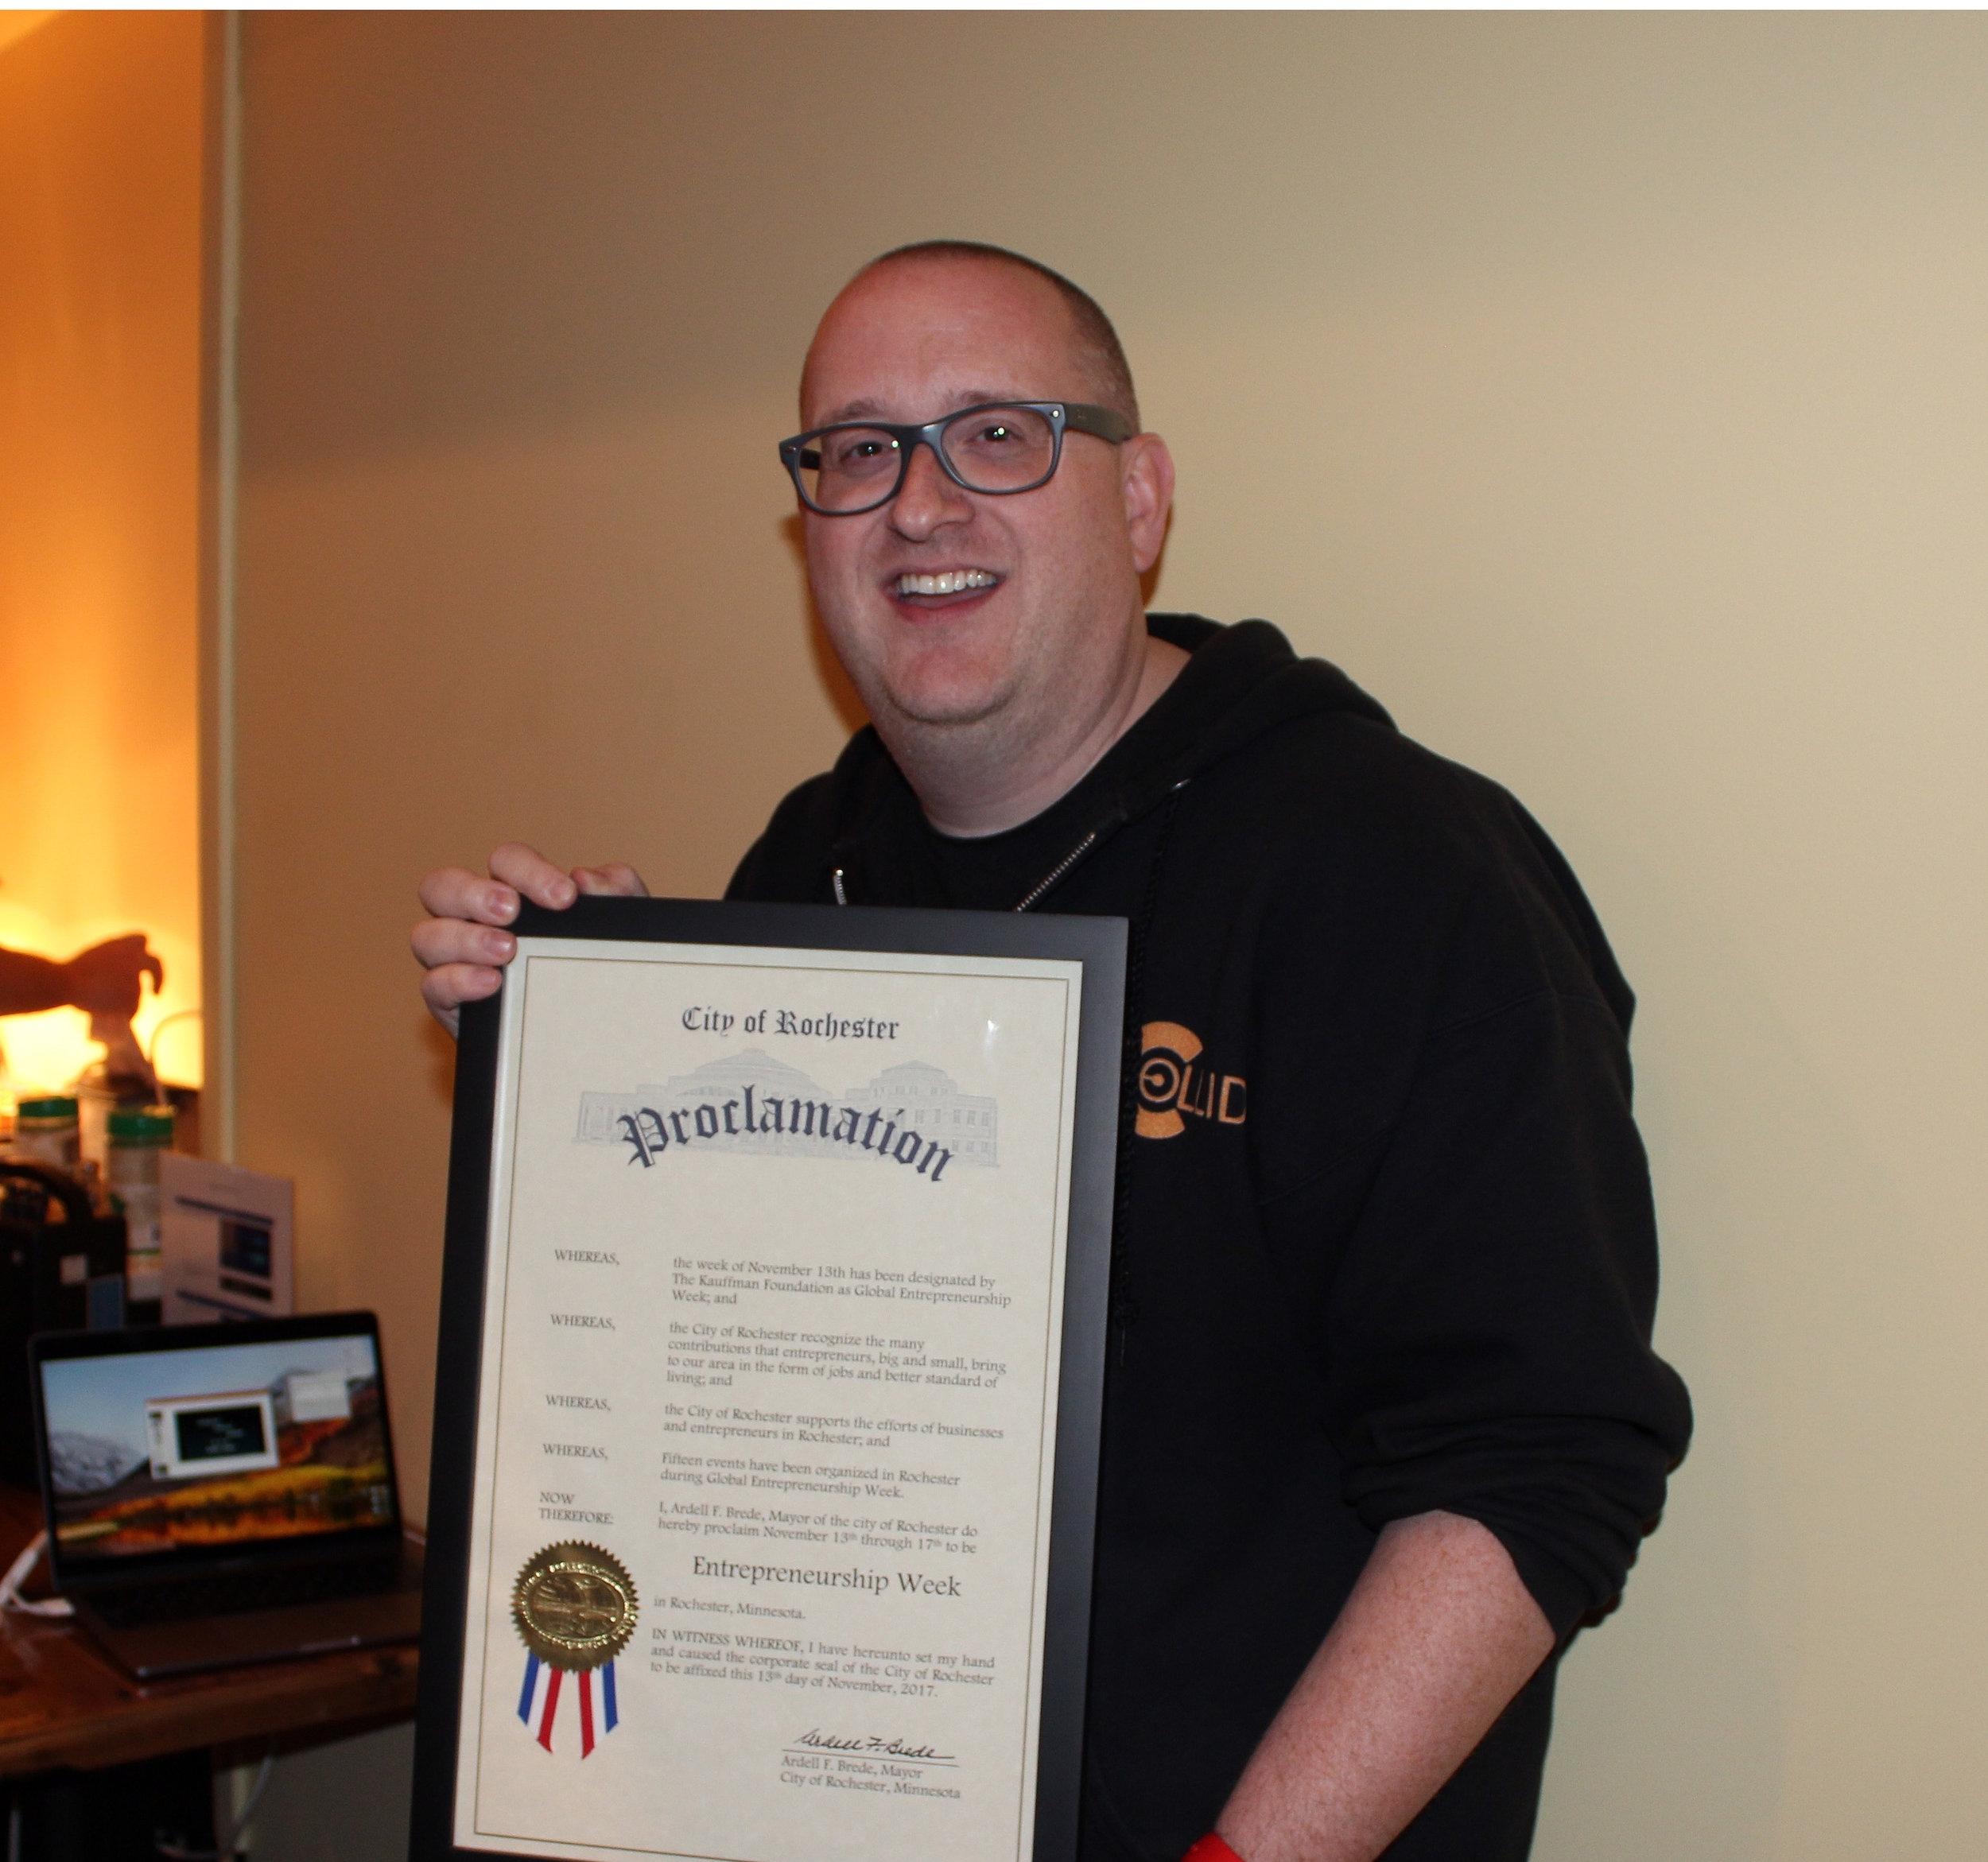 Rochester Global Entrepreneurship Week lead organizer Jamie Sundsbak holding the proclamation from Mayor Brede.